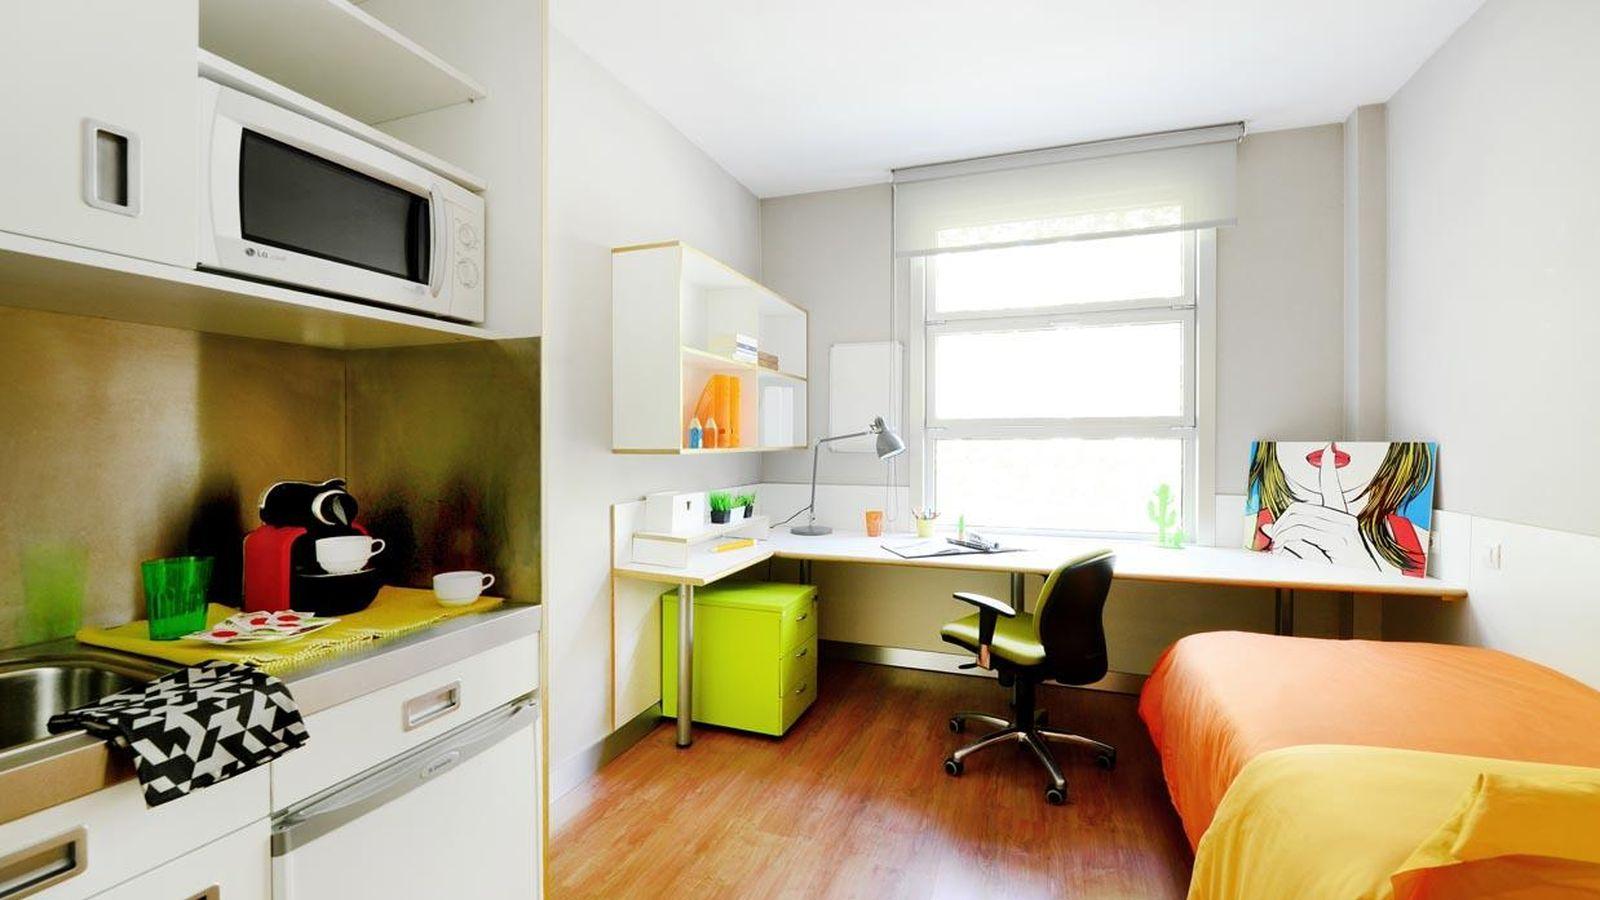 Foto: Foto: The Student Housing.